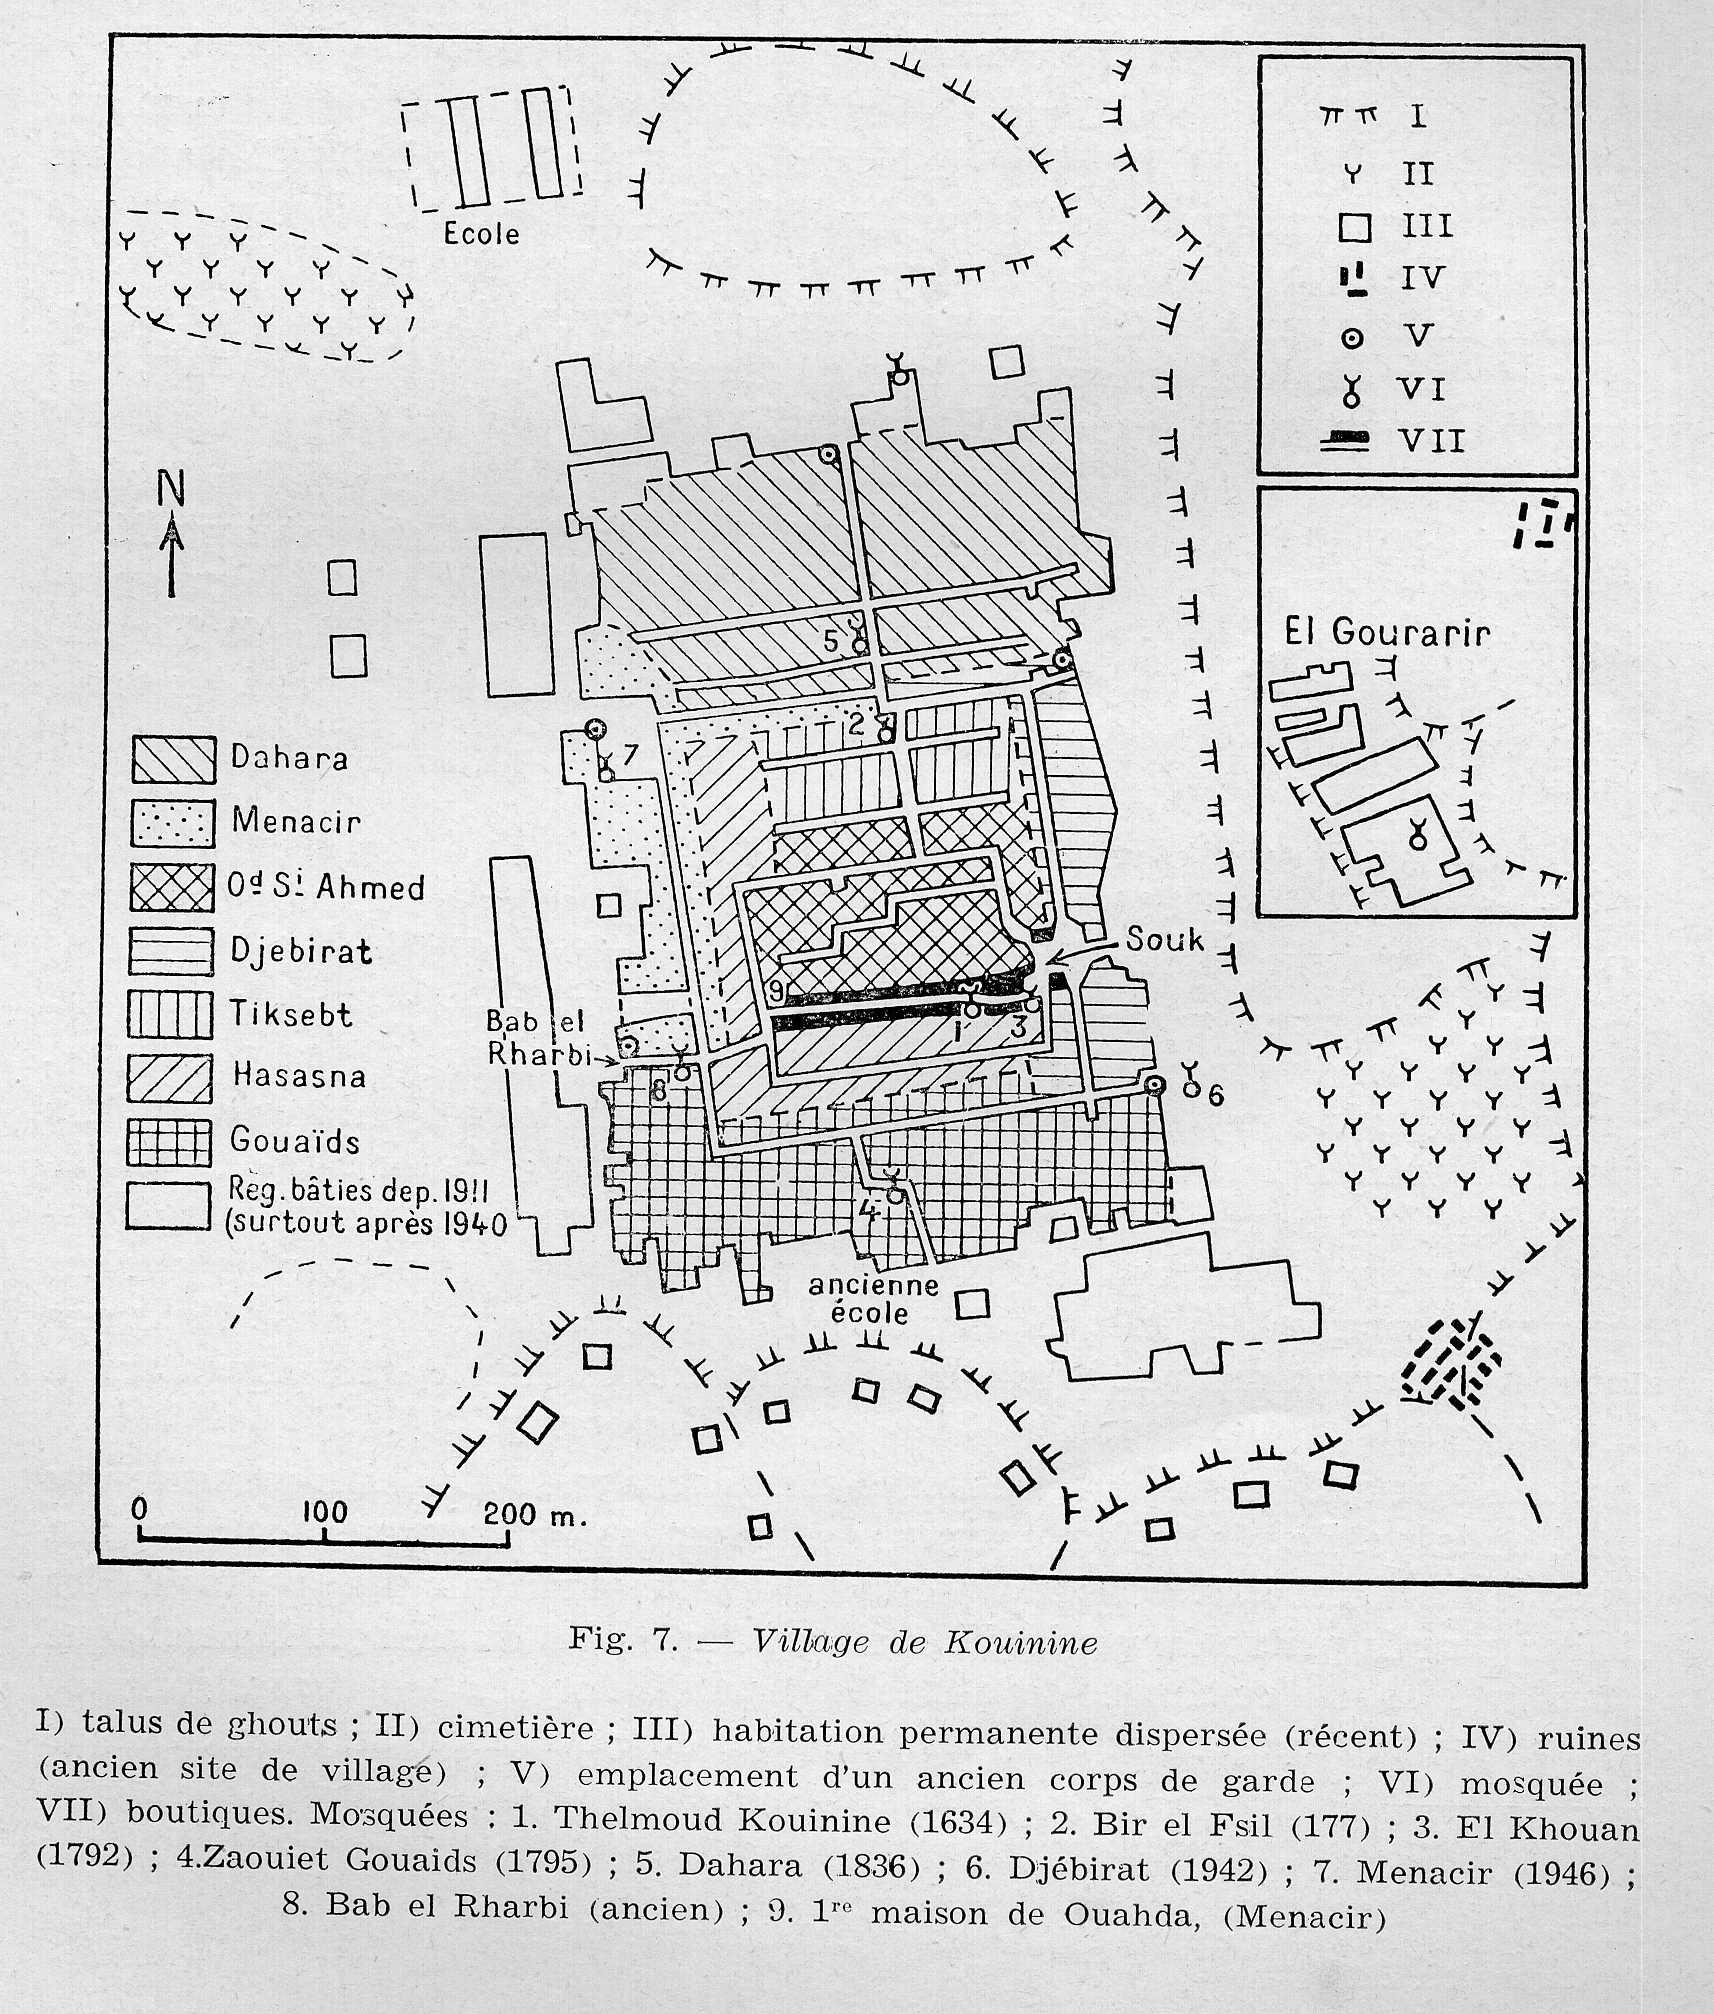 plan de Kouinine, un village en 1953